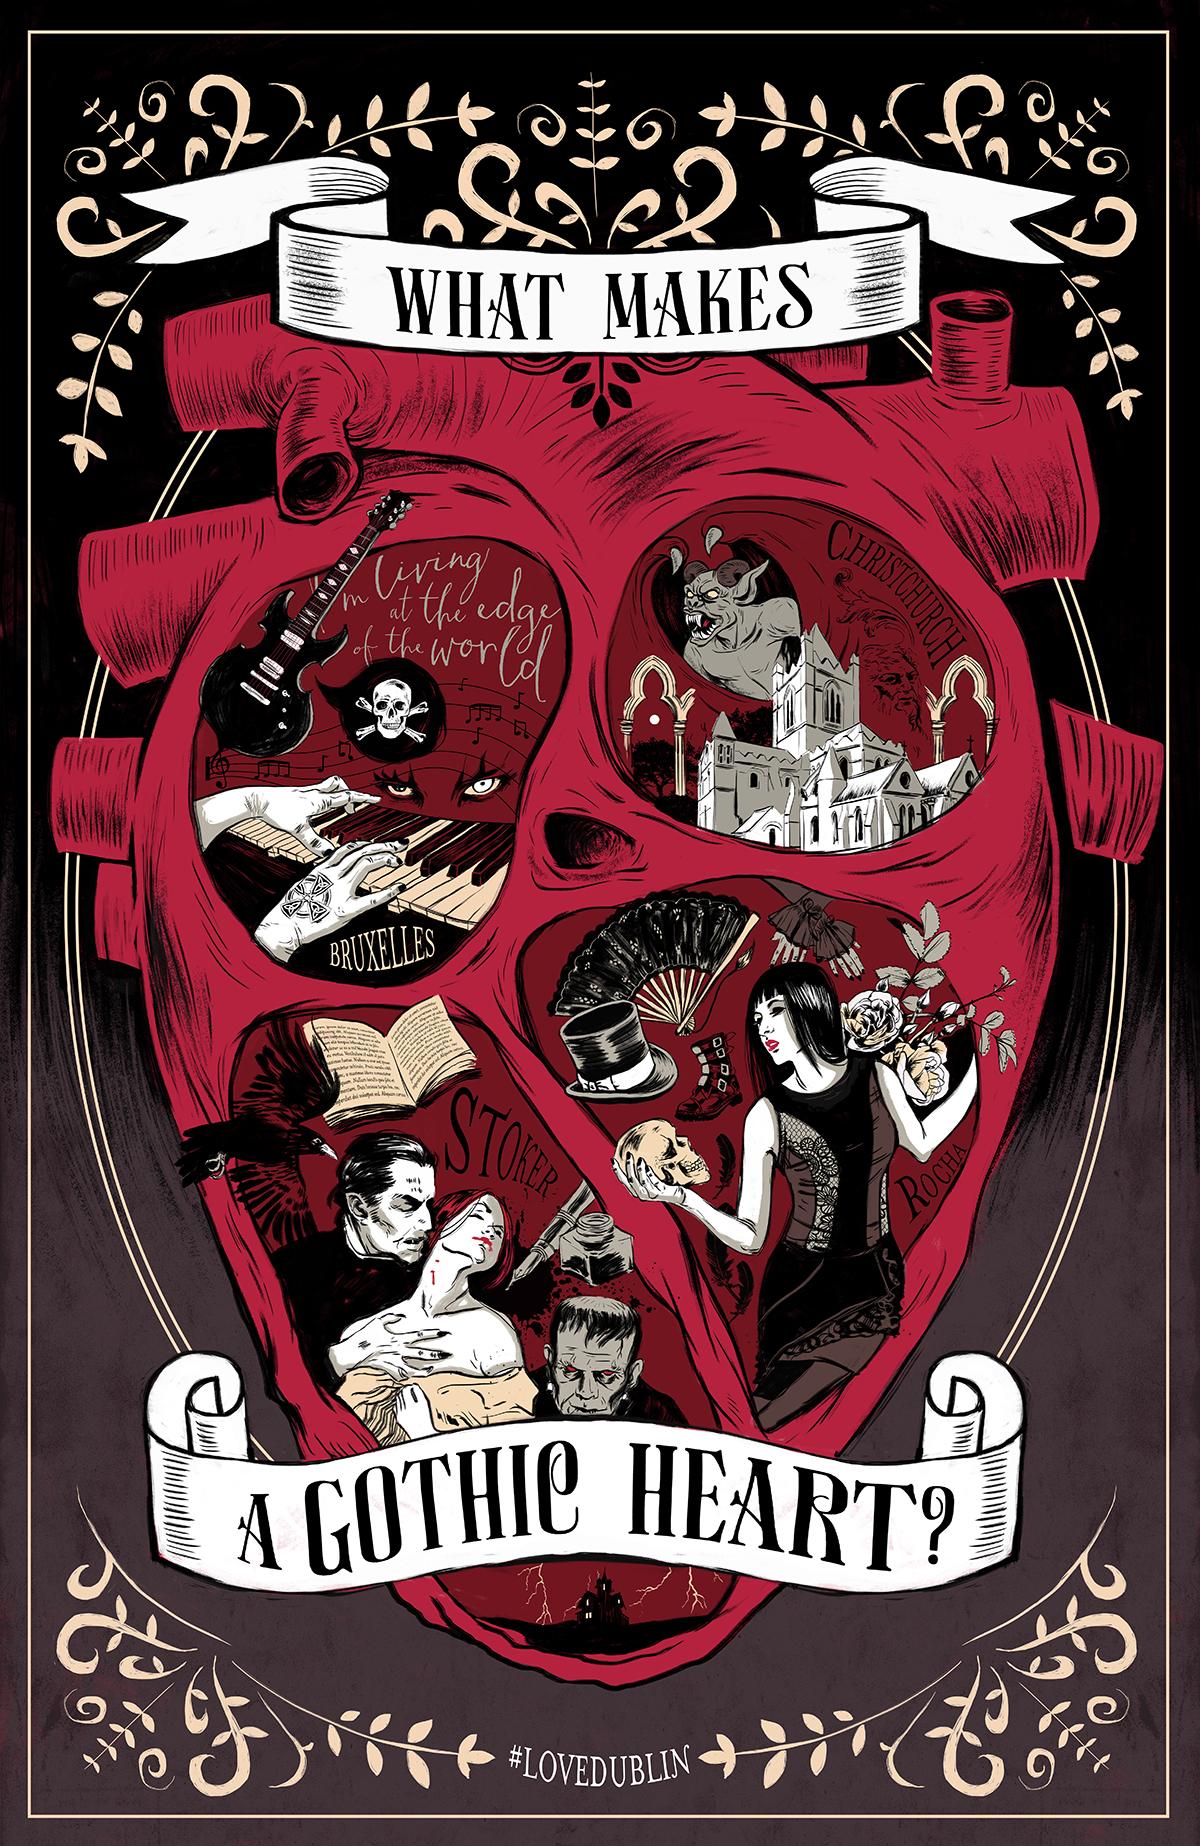 Bram Stoker Festival 2015 - Dracula Blodlines by Matthew Griffin